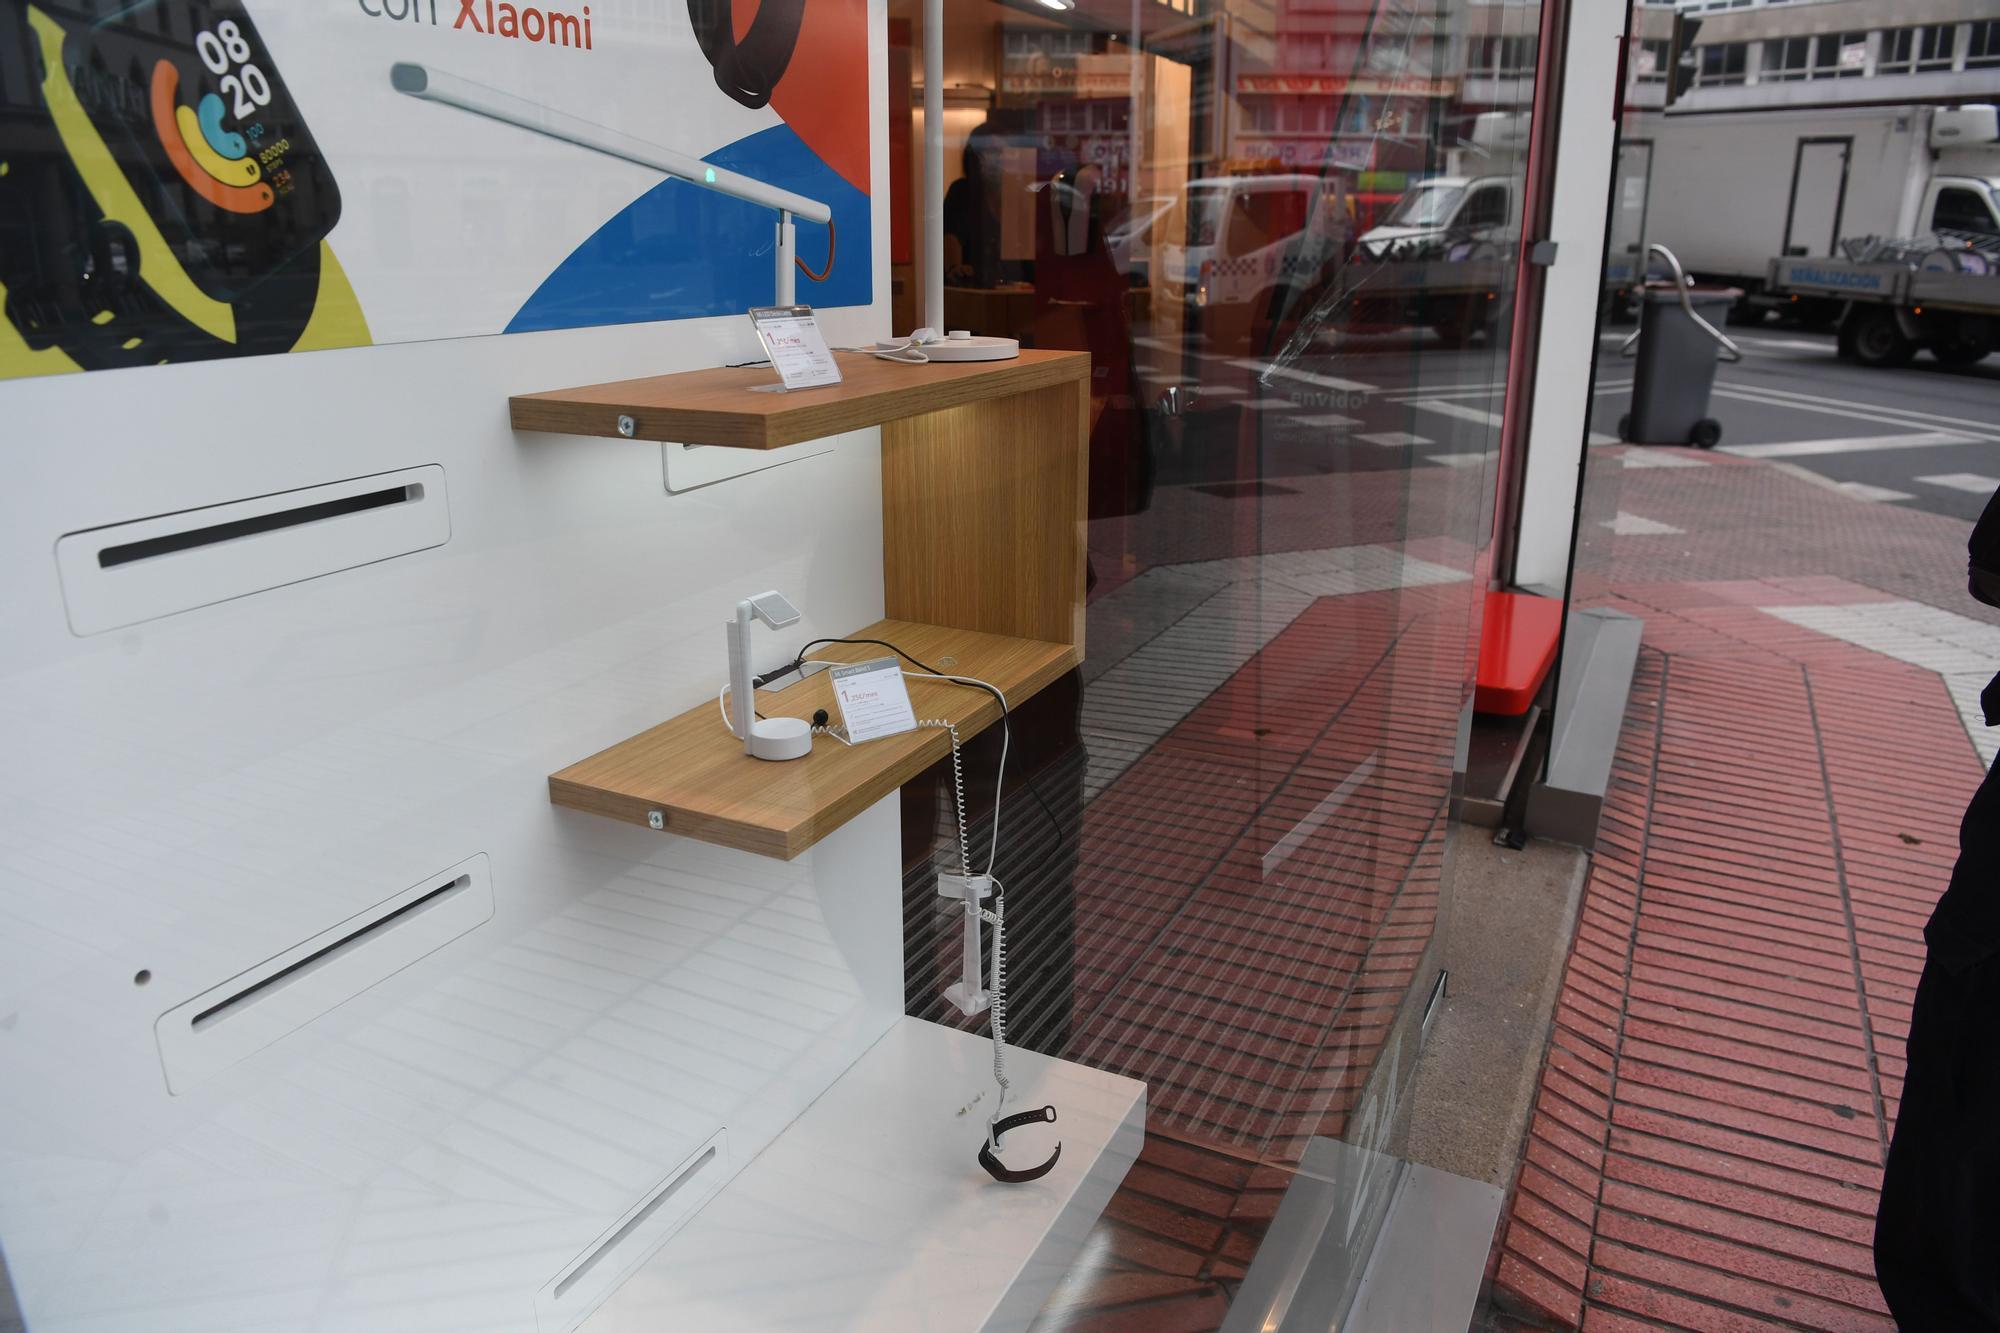 Asaltan de madrugada la tienda de Vodafone en la plaza de Pontevedra